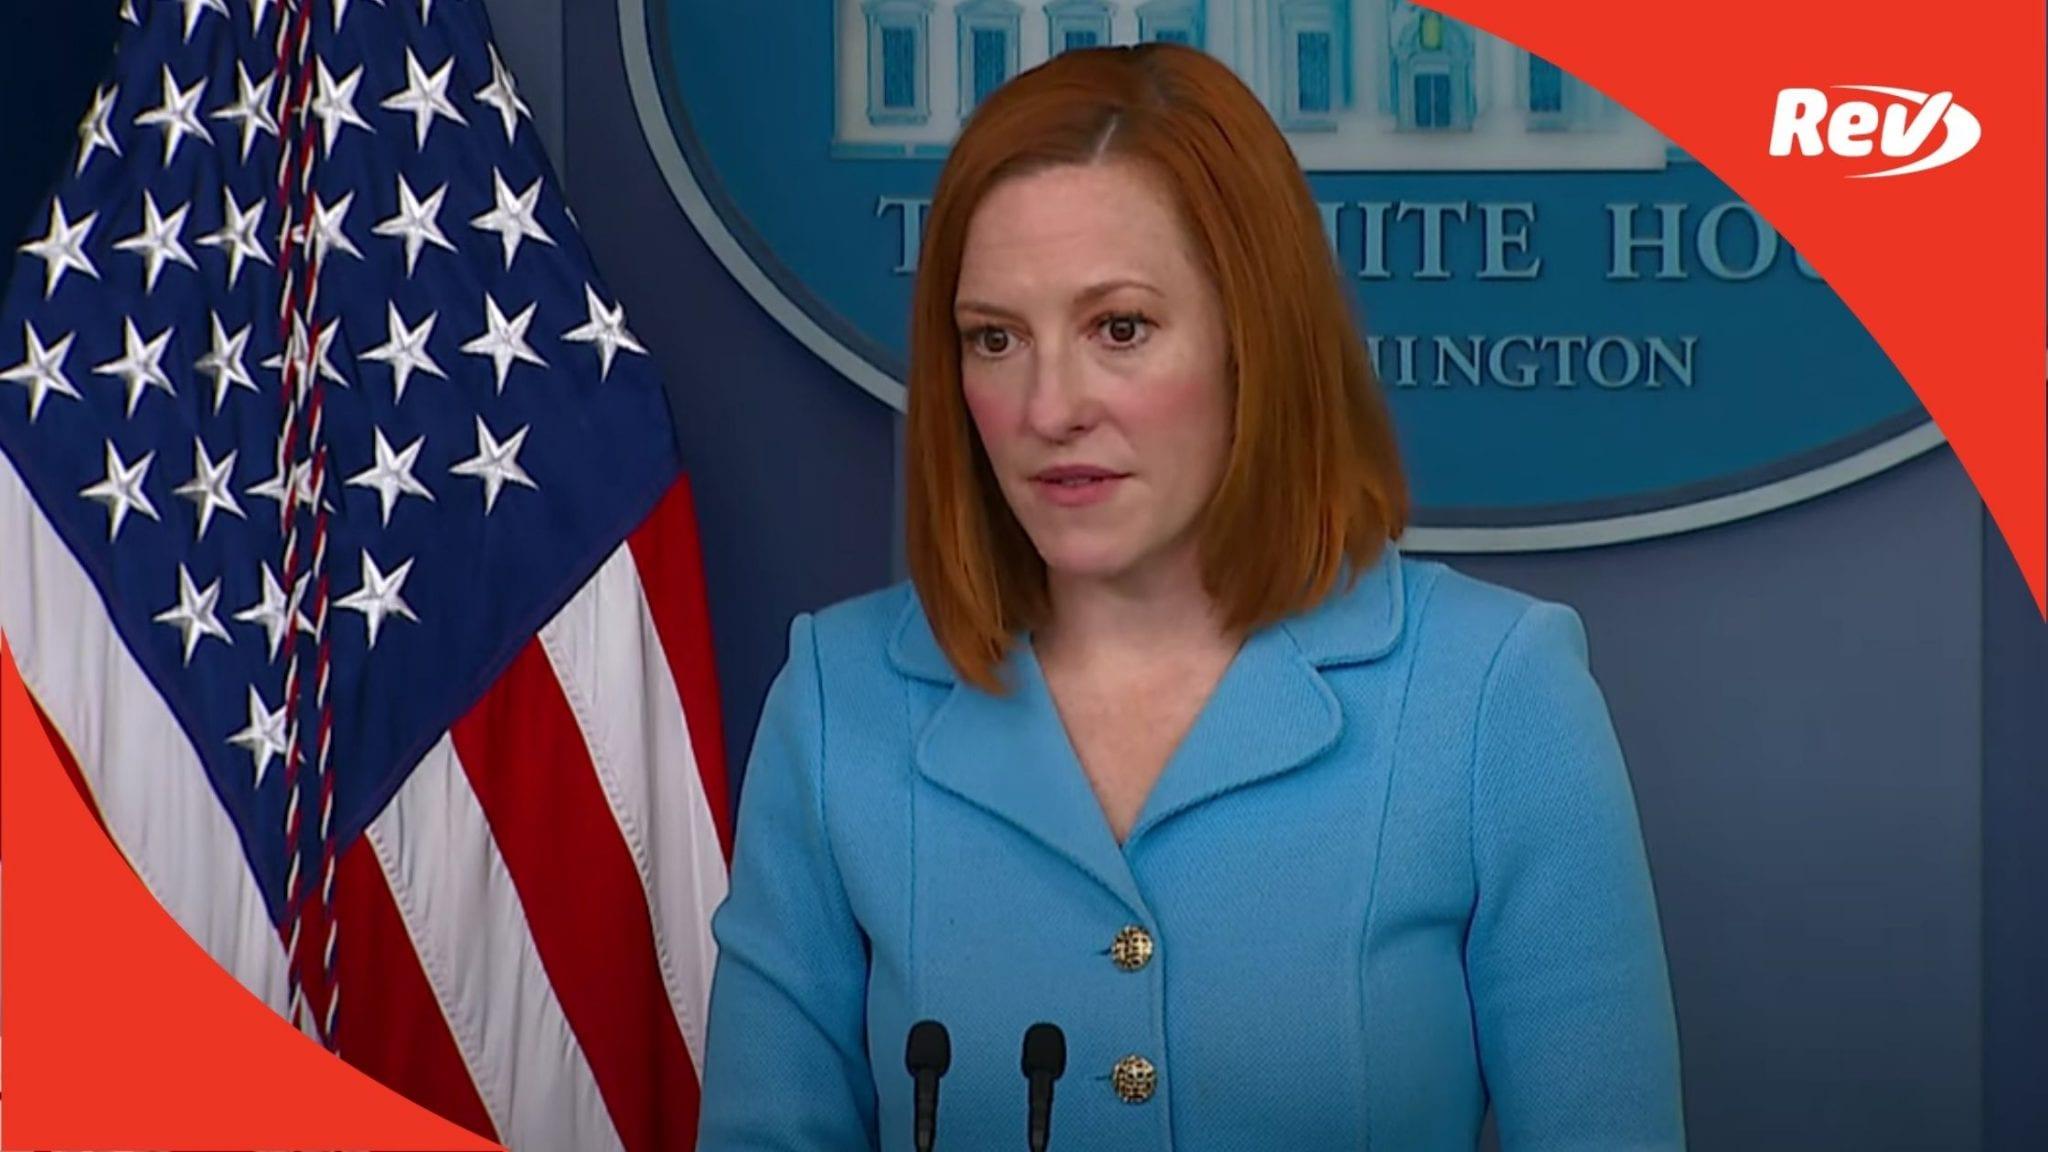 Press Secretary Jen Psaki White House Press Conference Transcript June 2